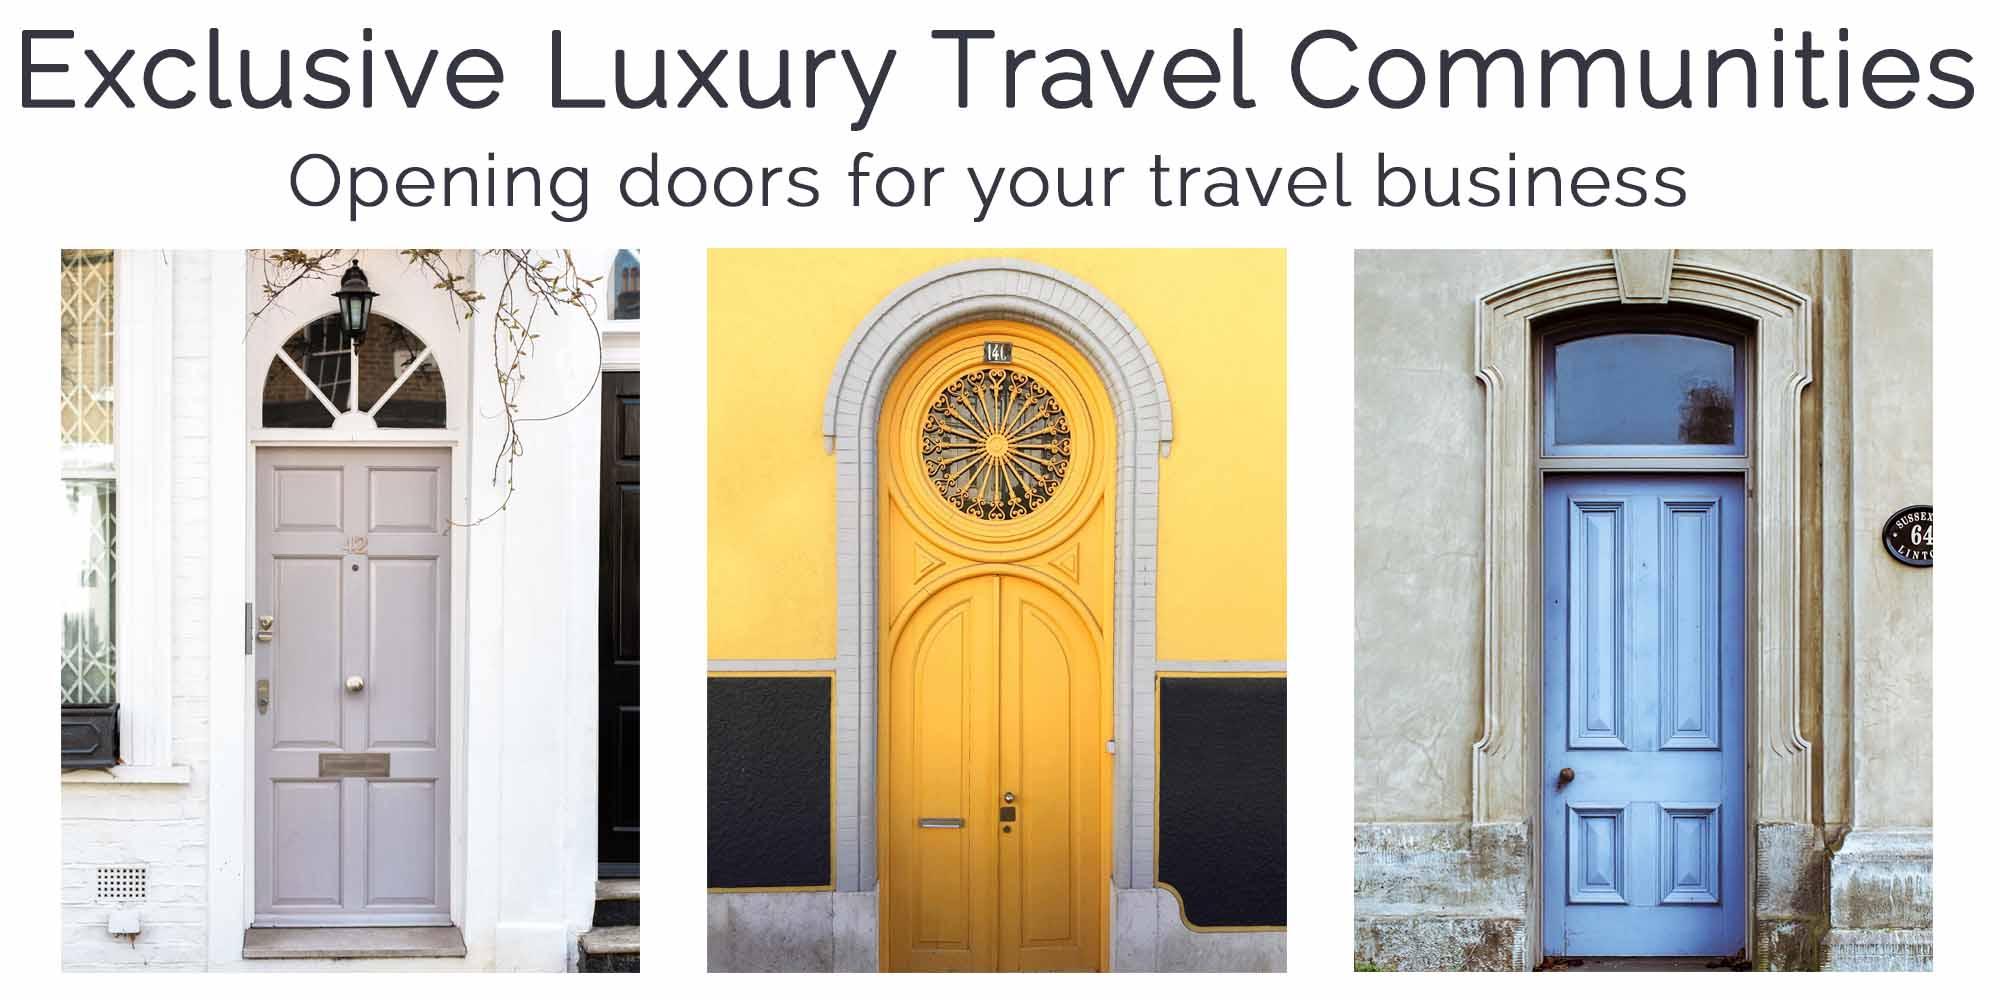 Exclusive Luxury Travel Communities